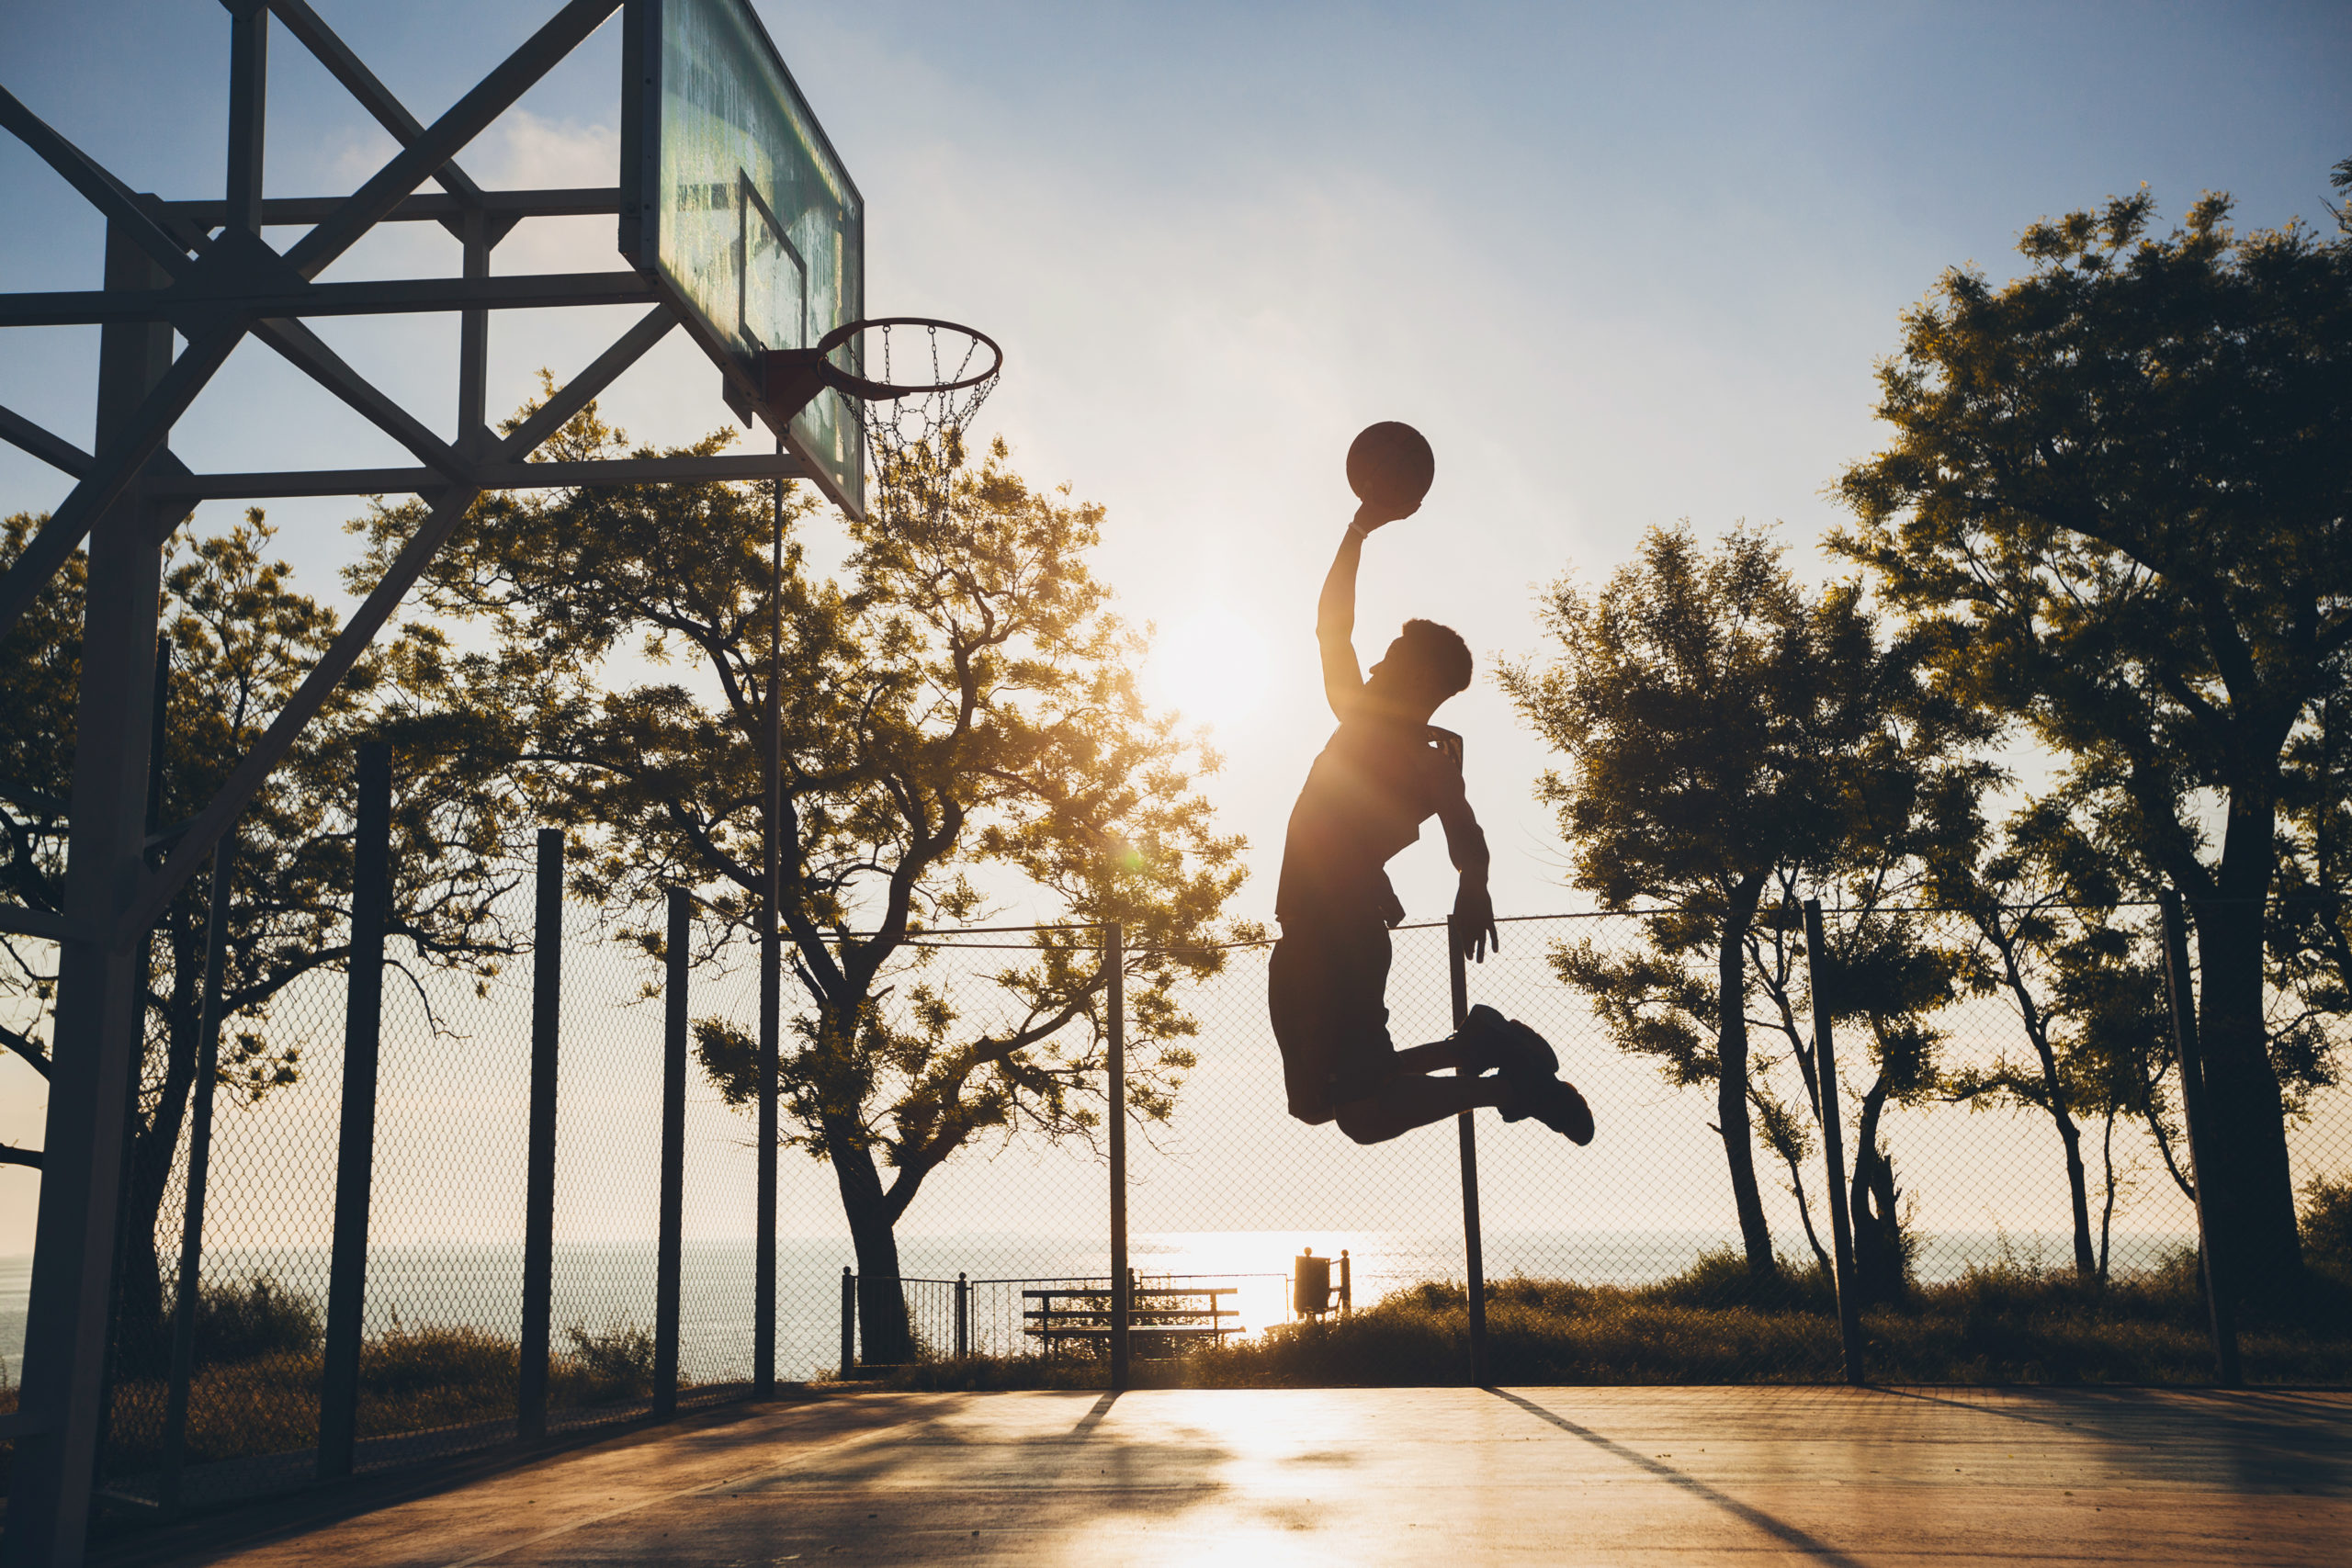 black man doing sports, playing basketball on sunrise, jumping silhouette